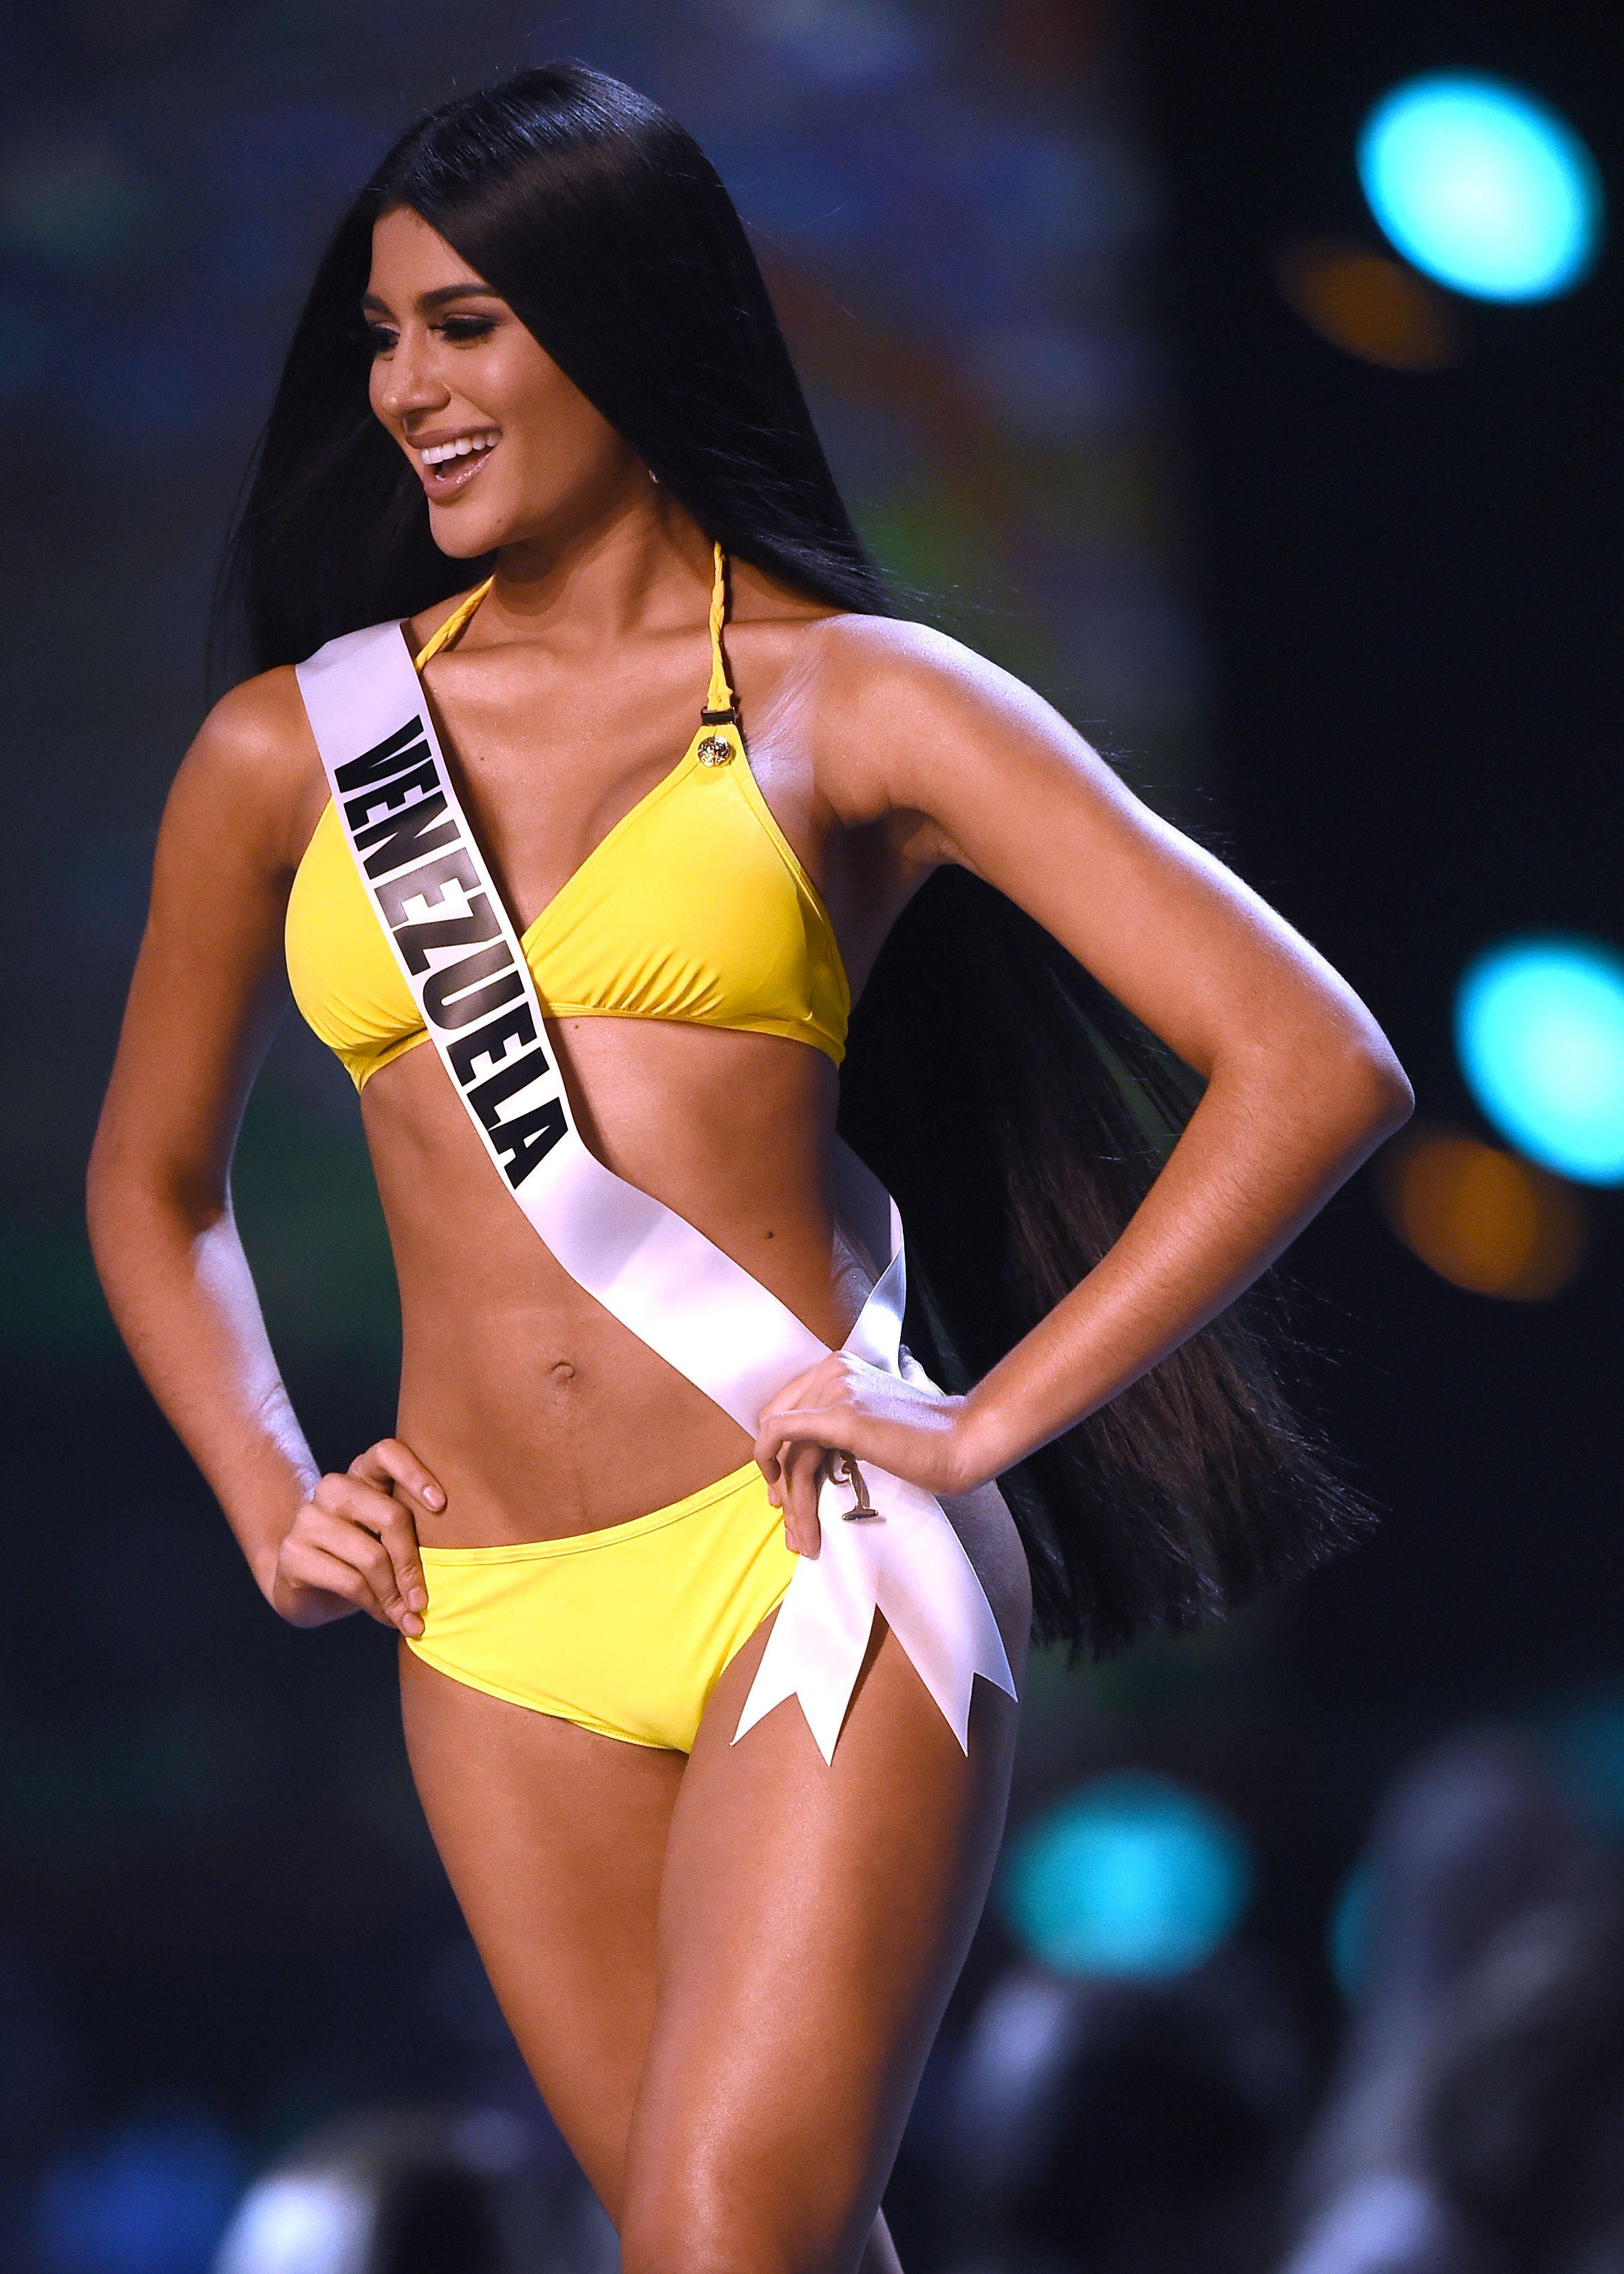 Sthefany Gutiérrez, Miss Venezuela